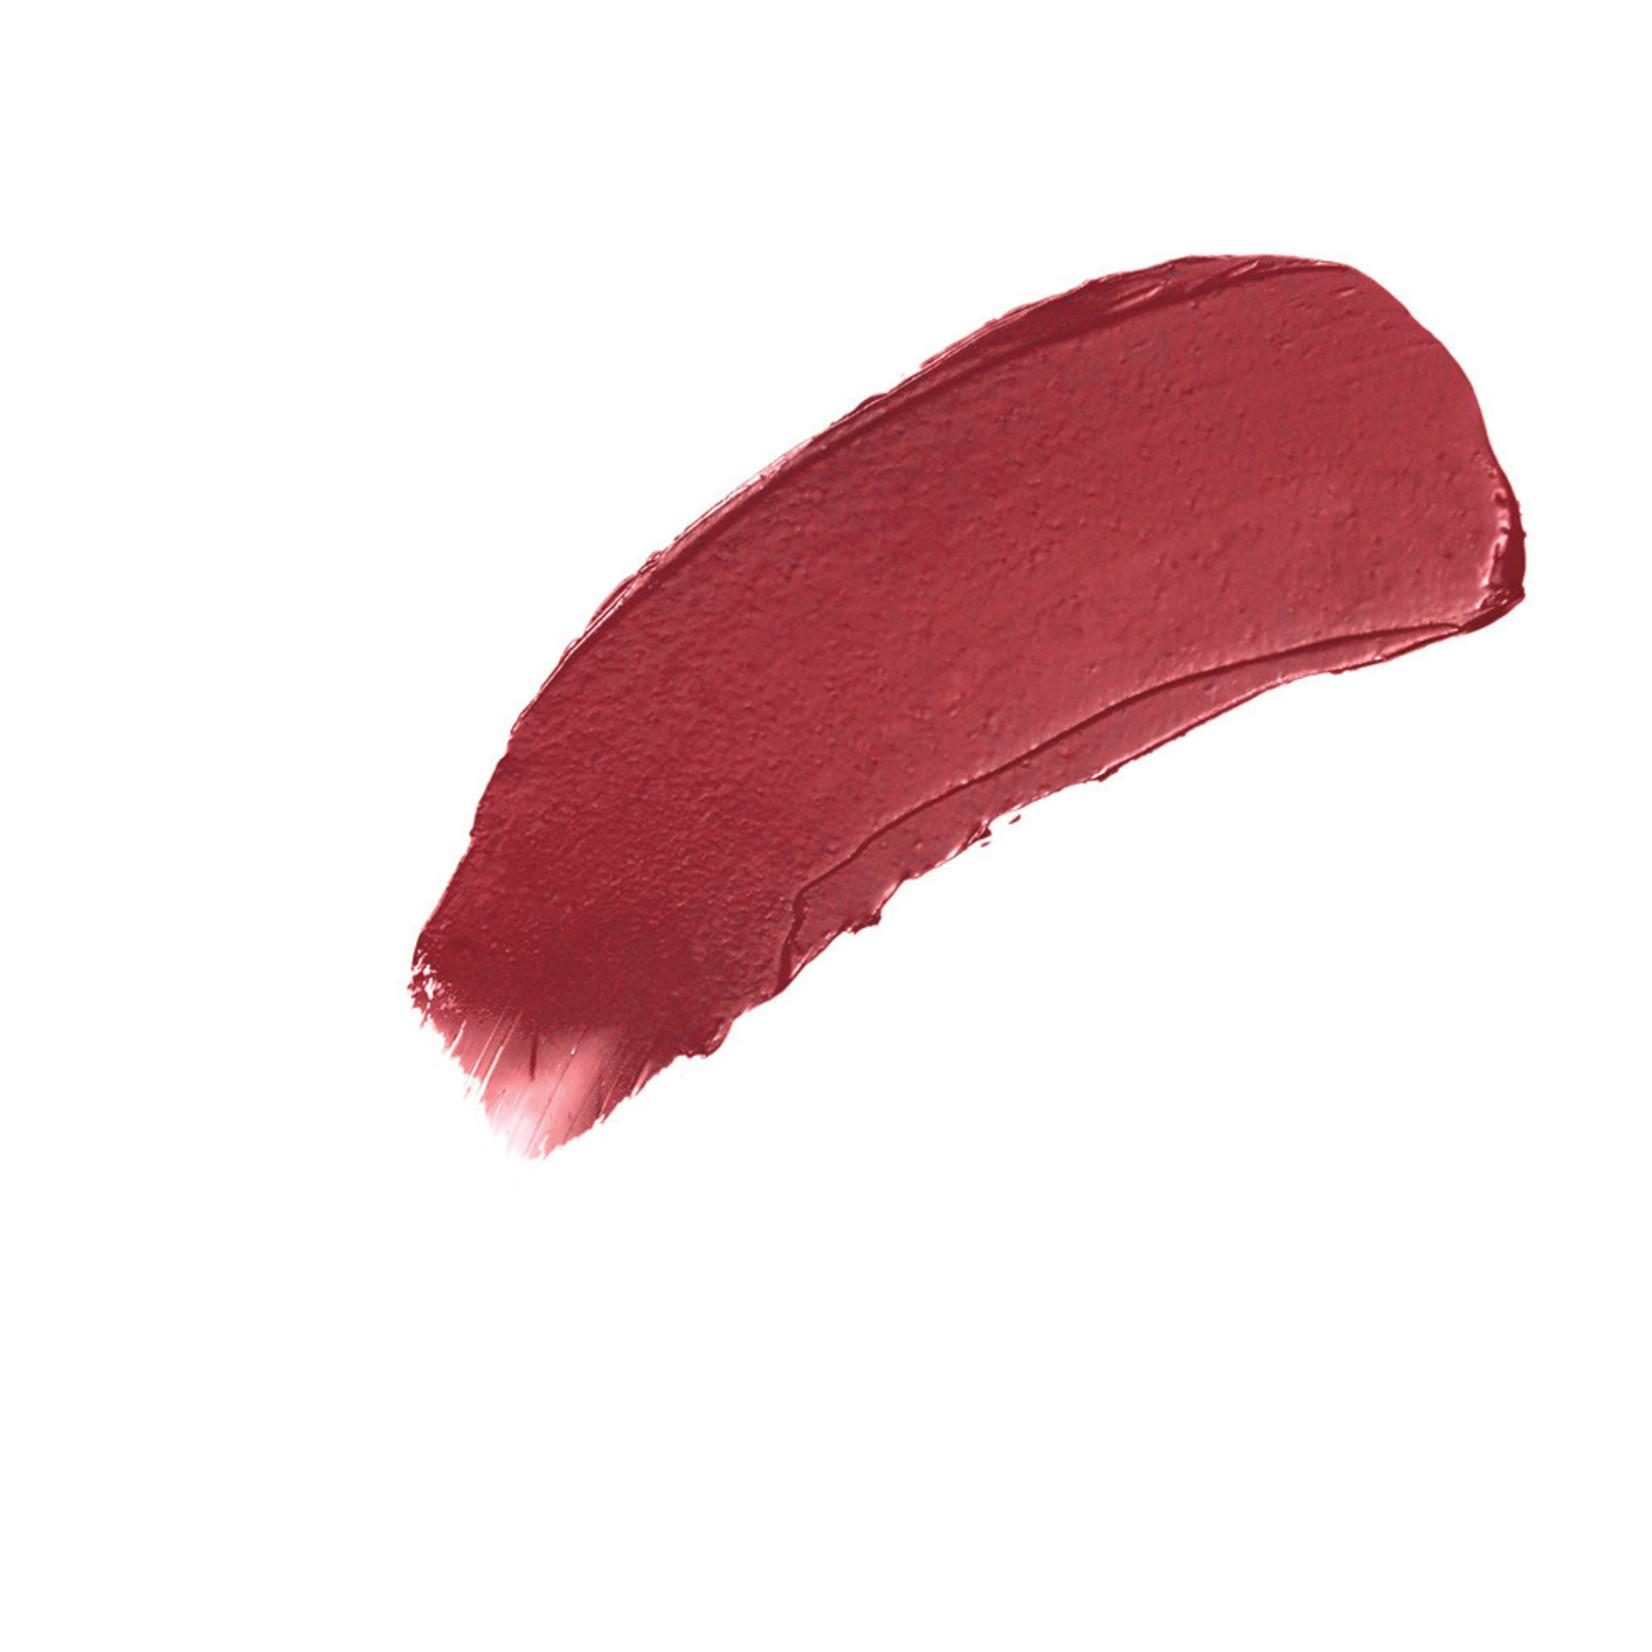 Triple luxe lipstick megan